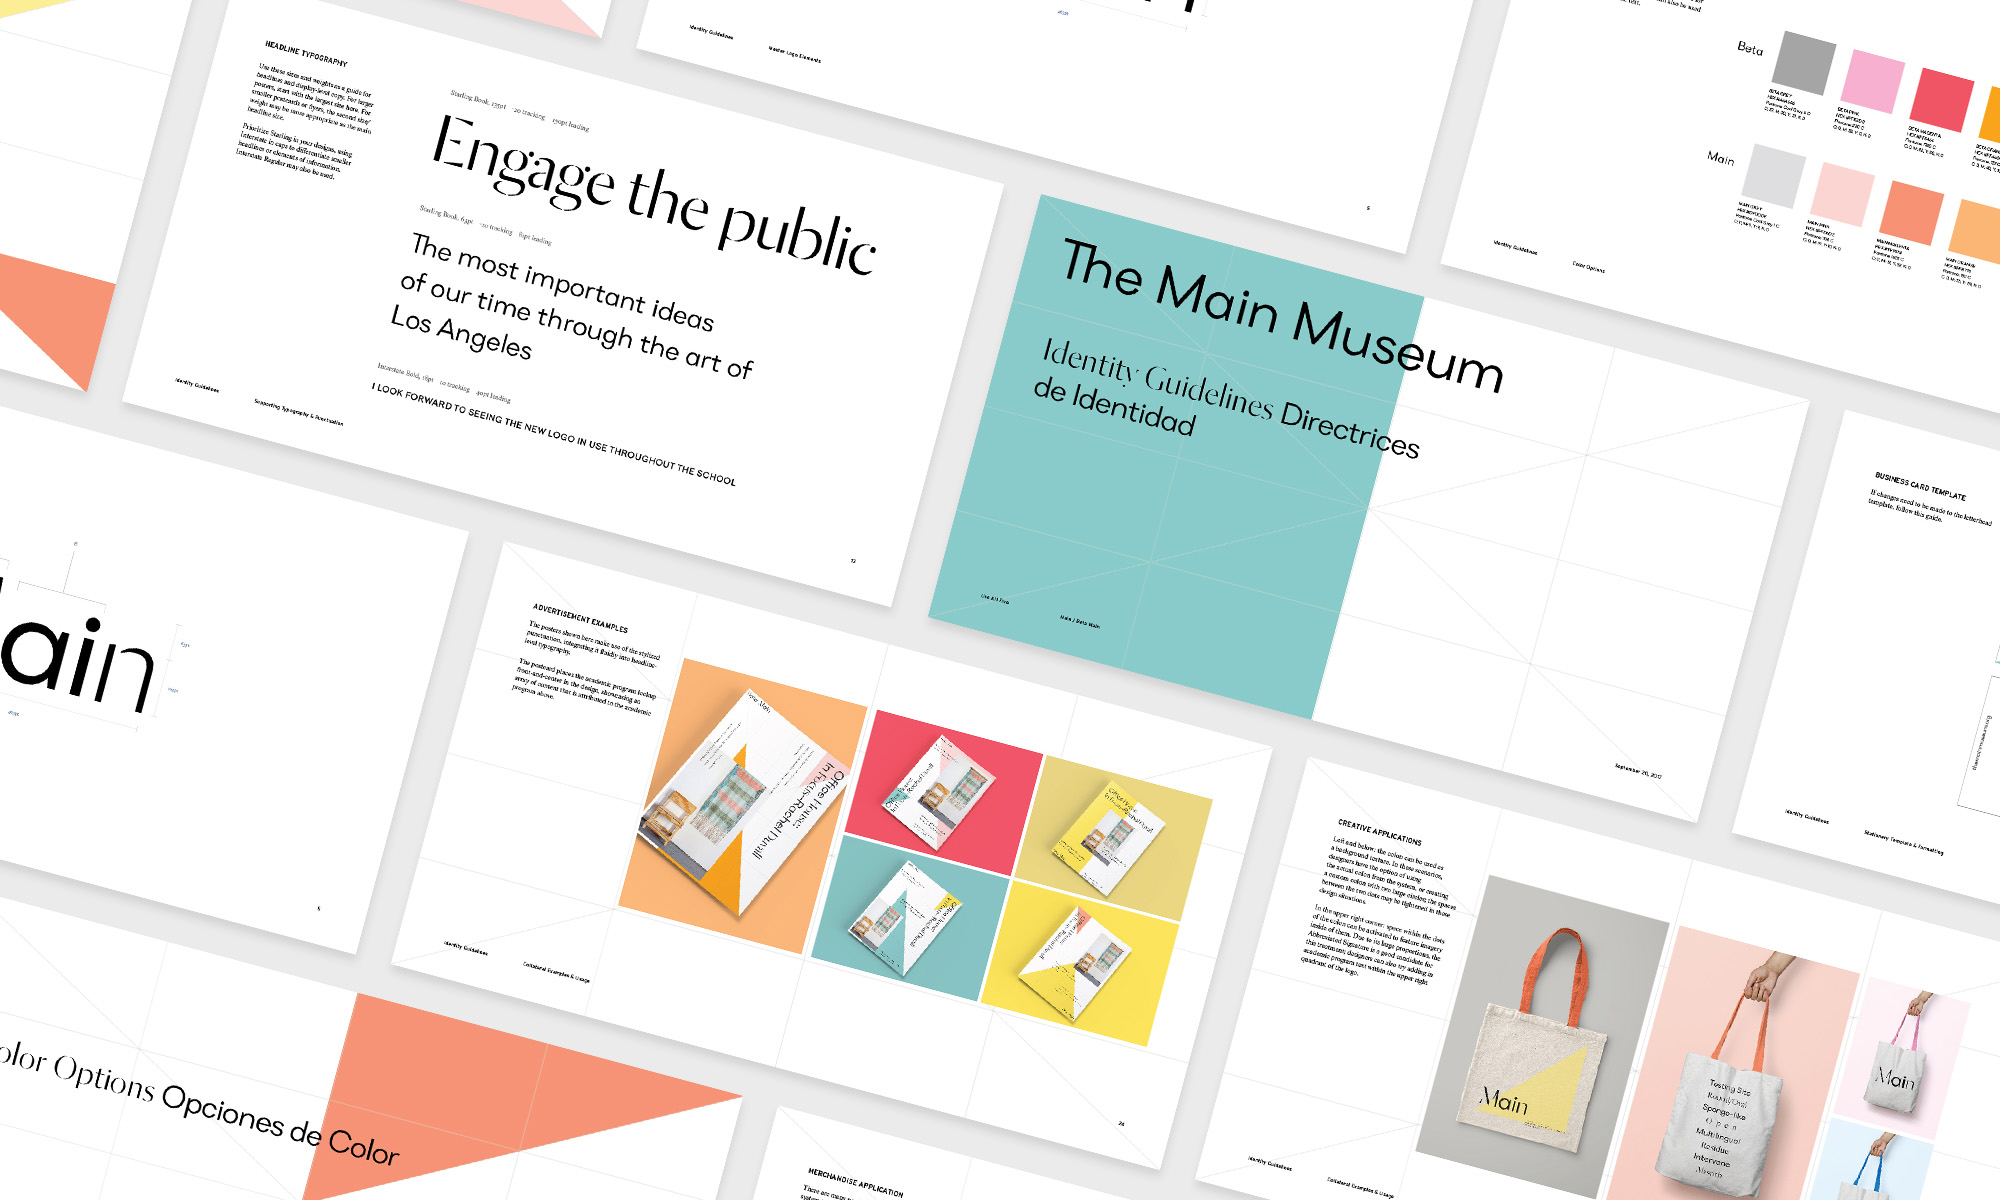 main-museum-brand-guidelines.jpg